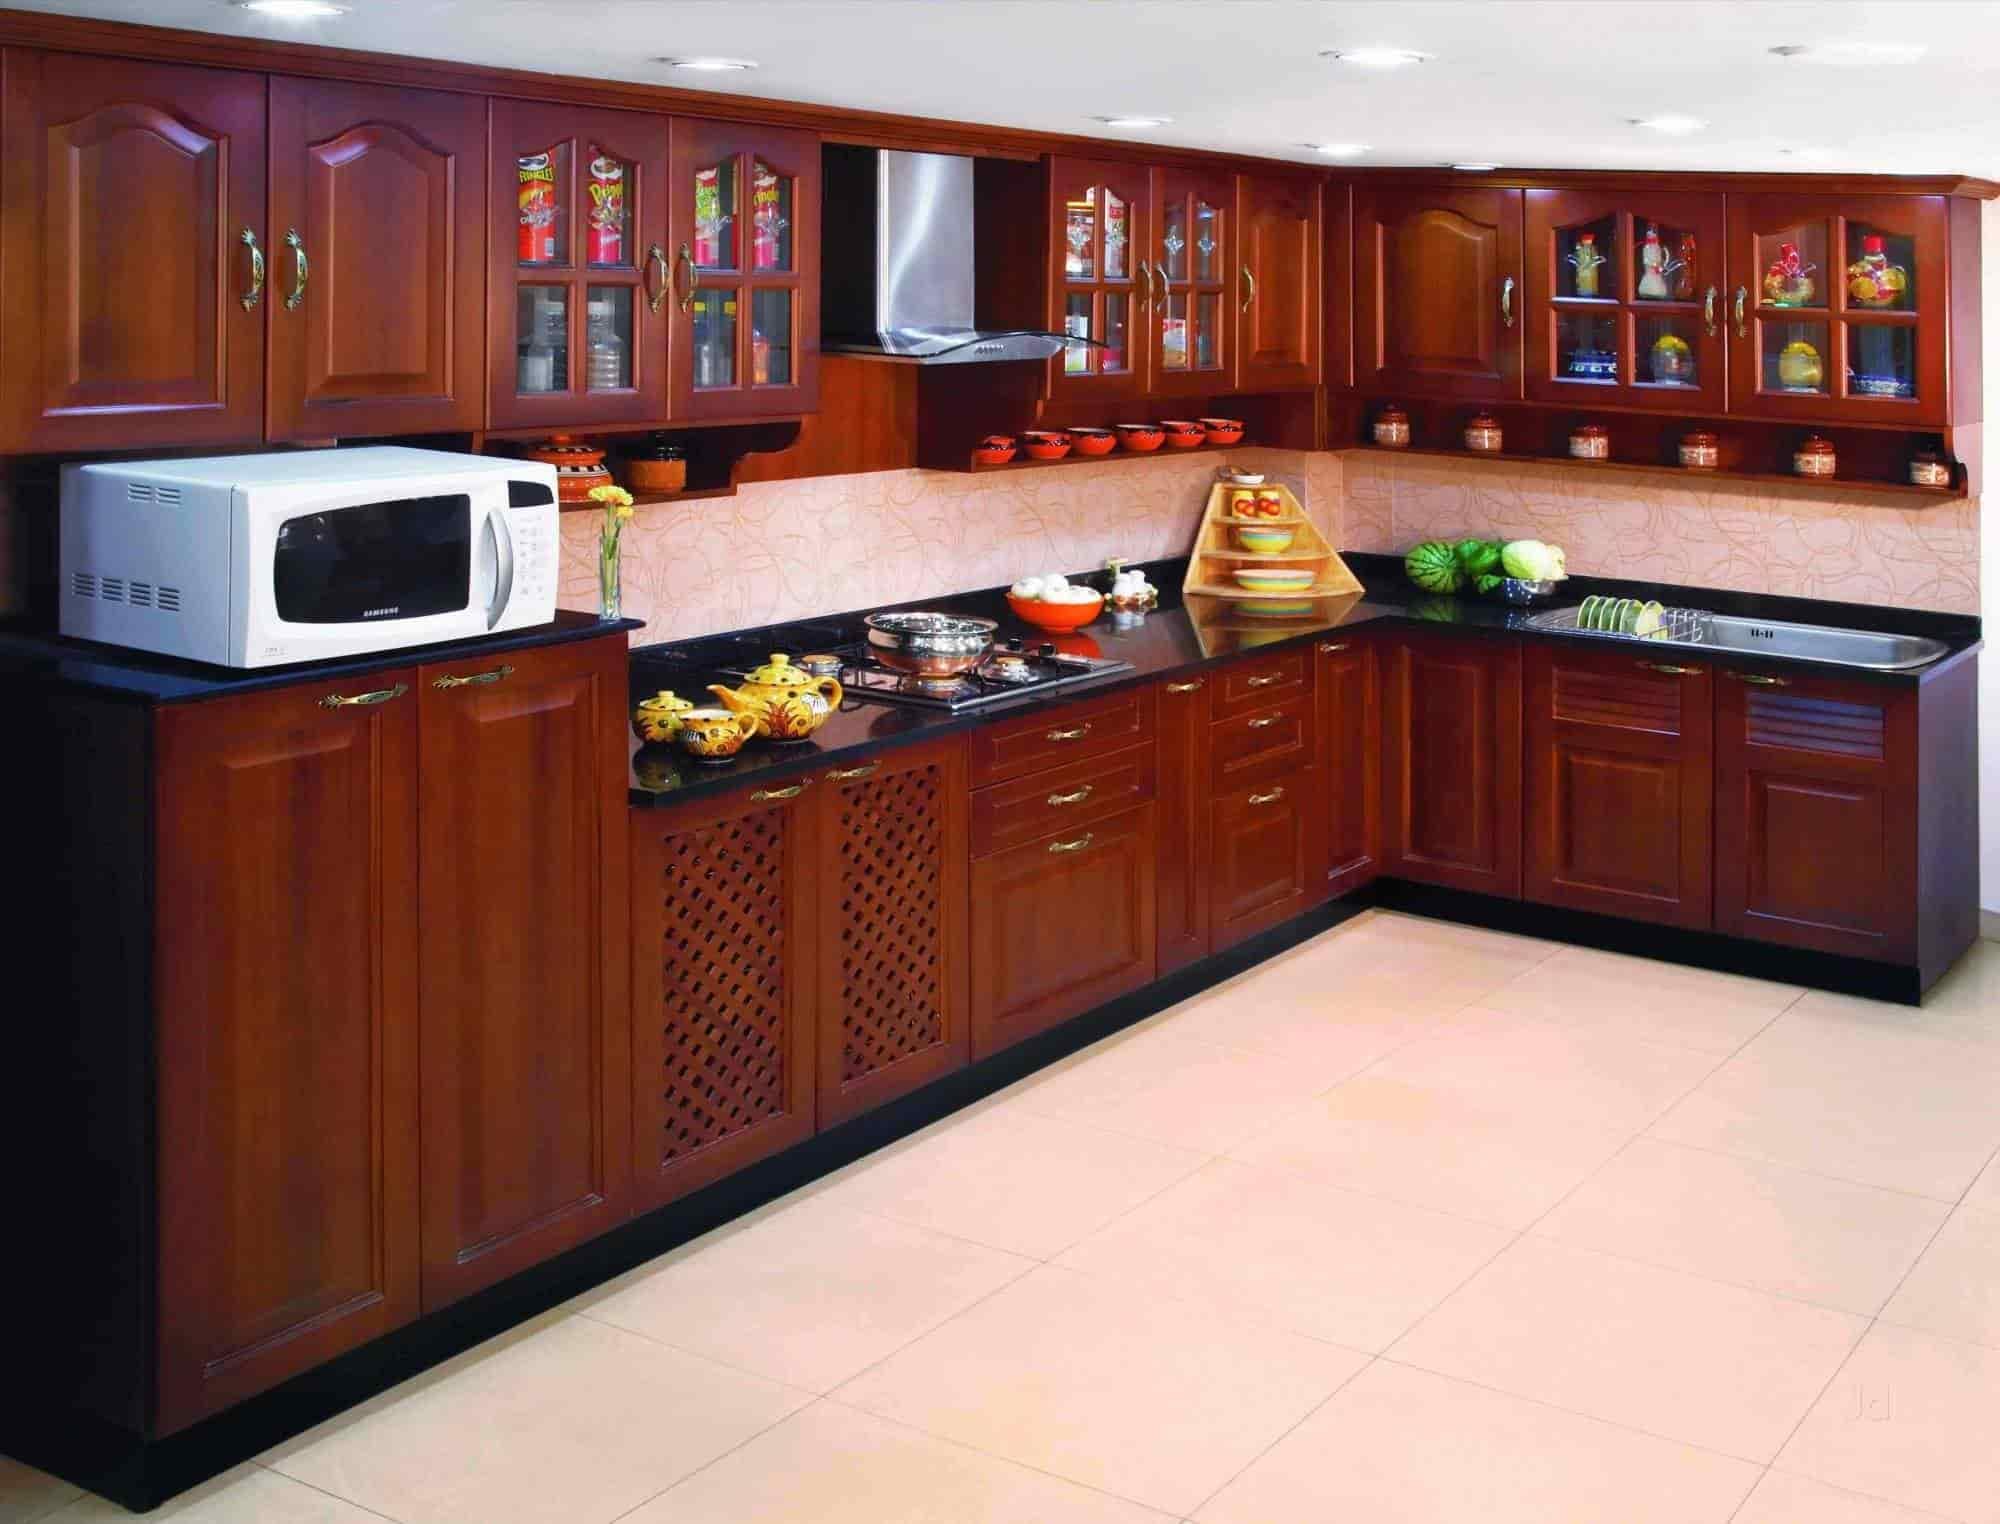 Top 10 Pvc Kitchen Cabinet Manufacturers In Mysore पवस क चन क ब न ट मन फक चरर स म सर Justdial